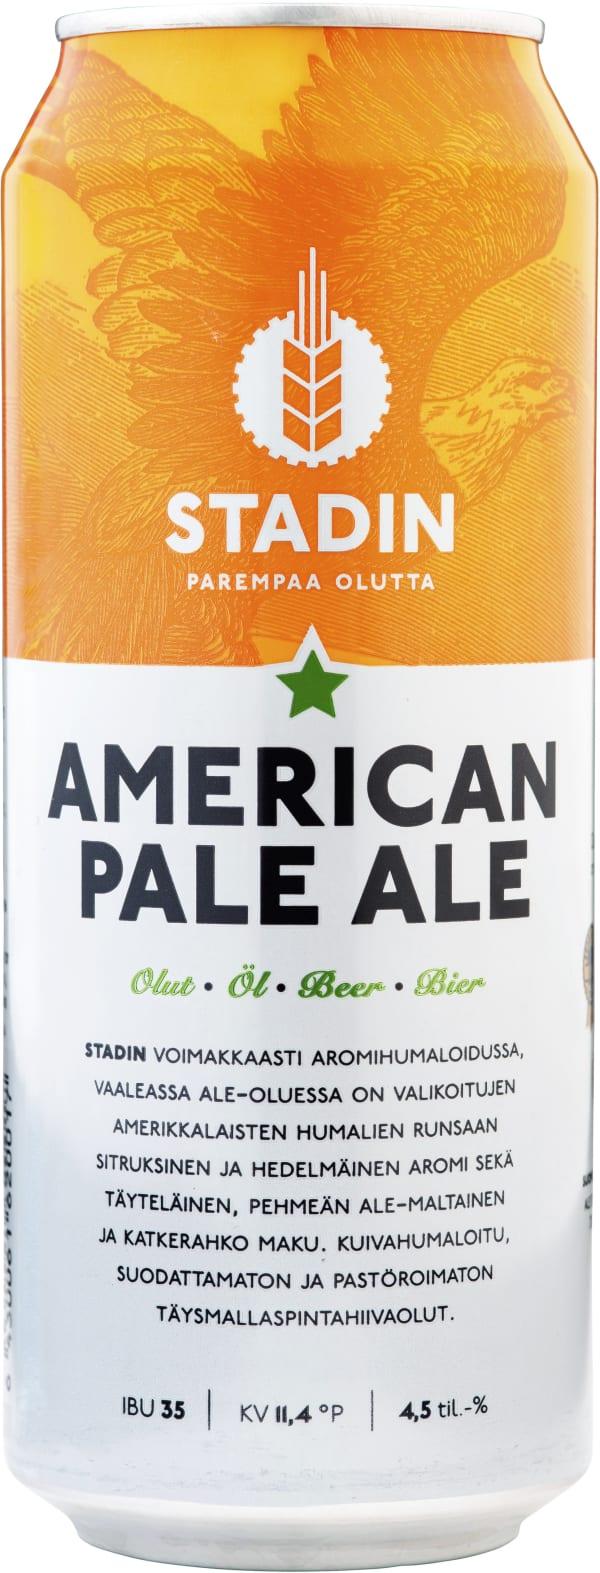 Stadin American Pale Ale burk